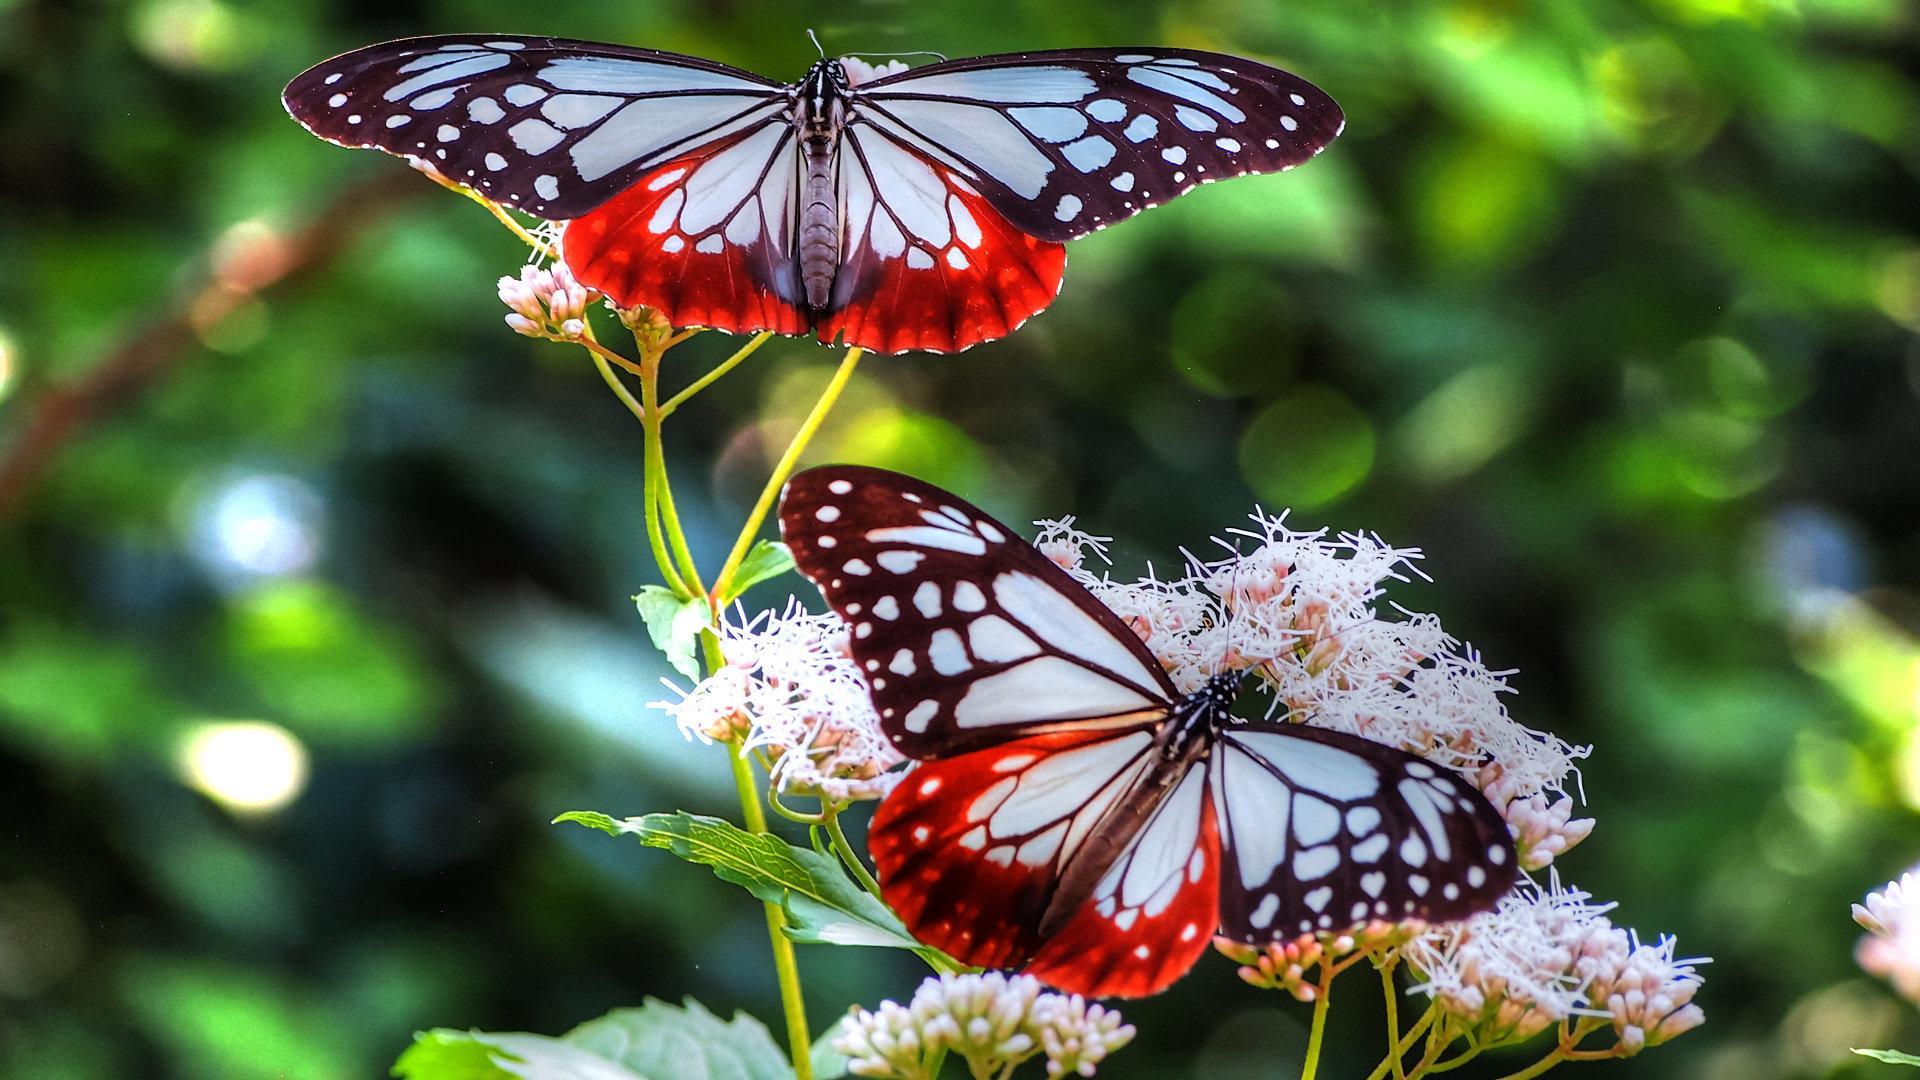 Full HD Butterfly Wallpapers - Top Free Full HD Butterfly ...